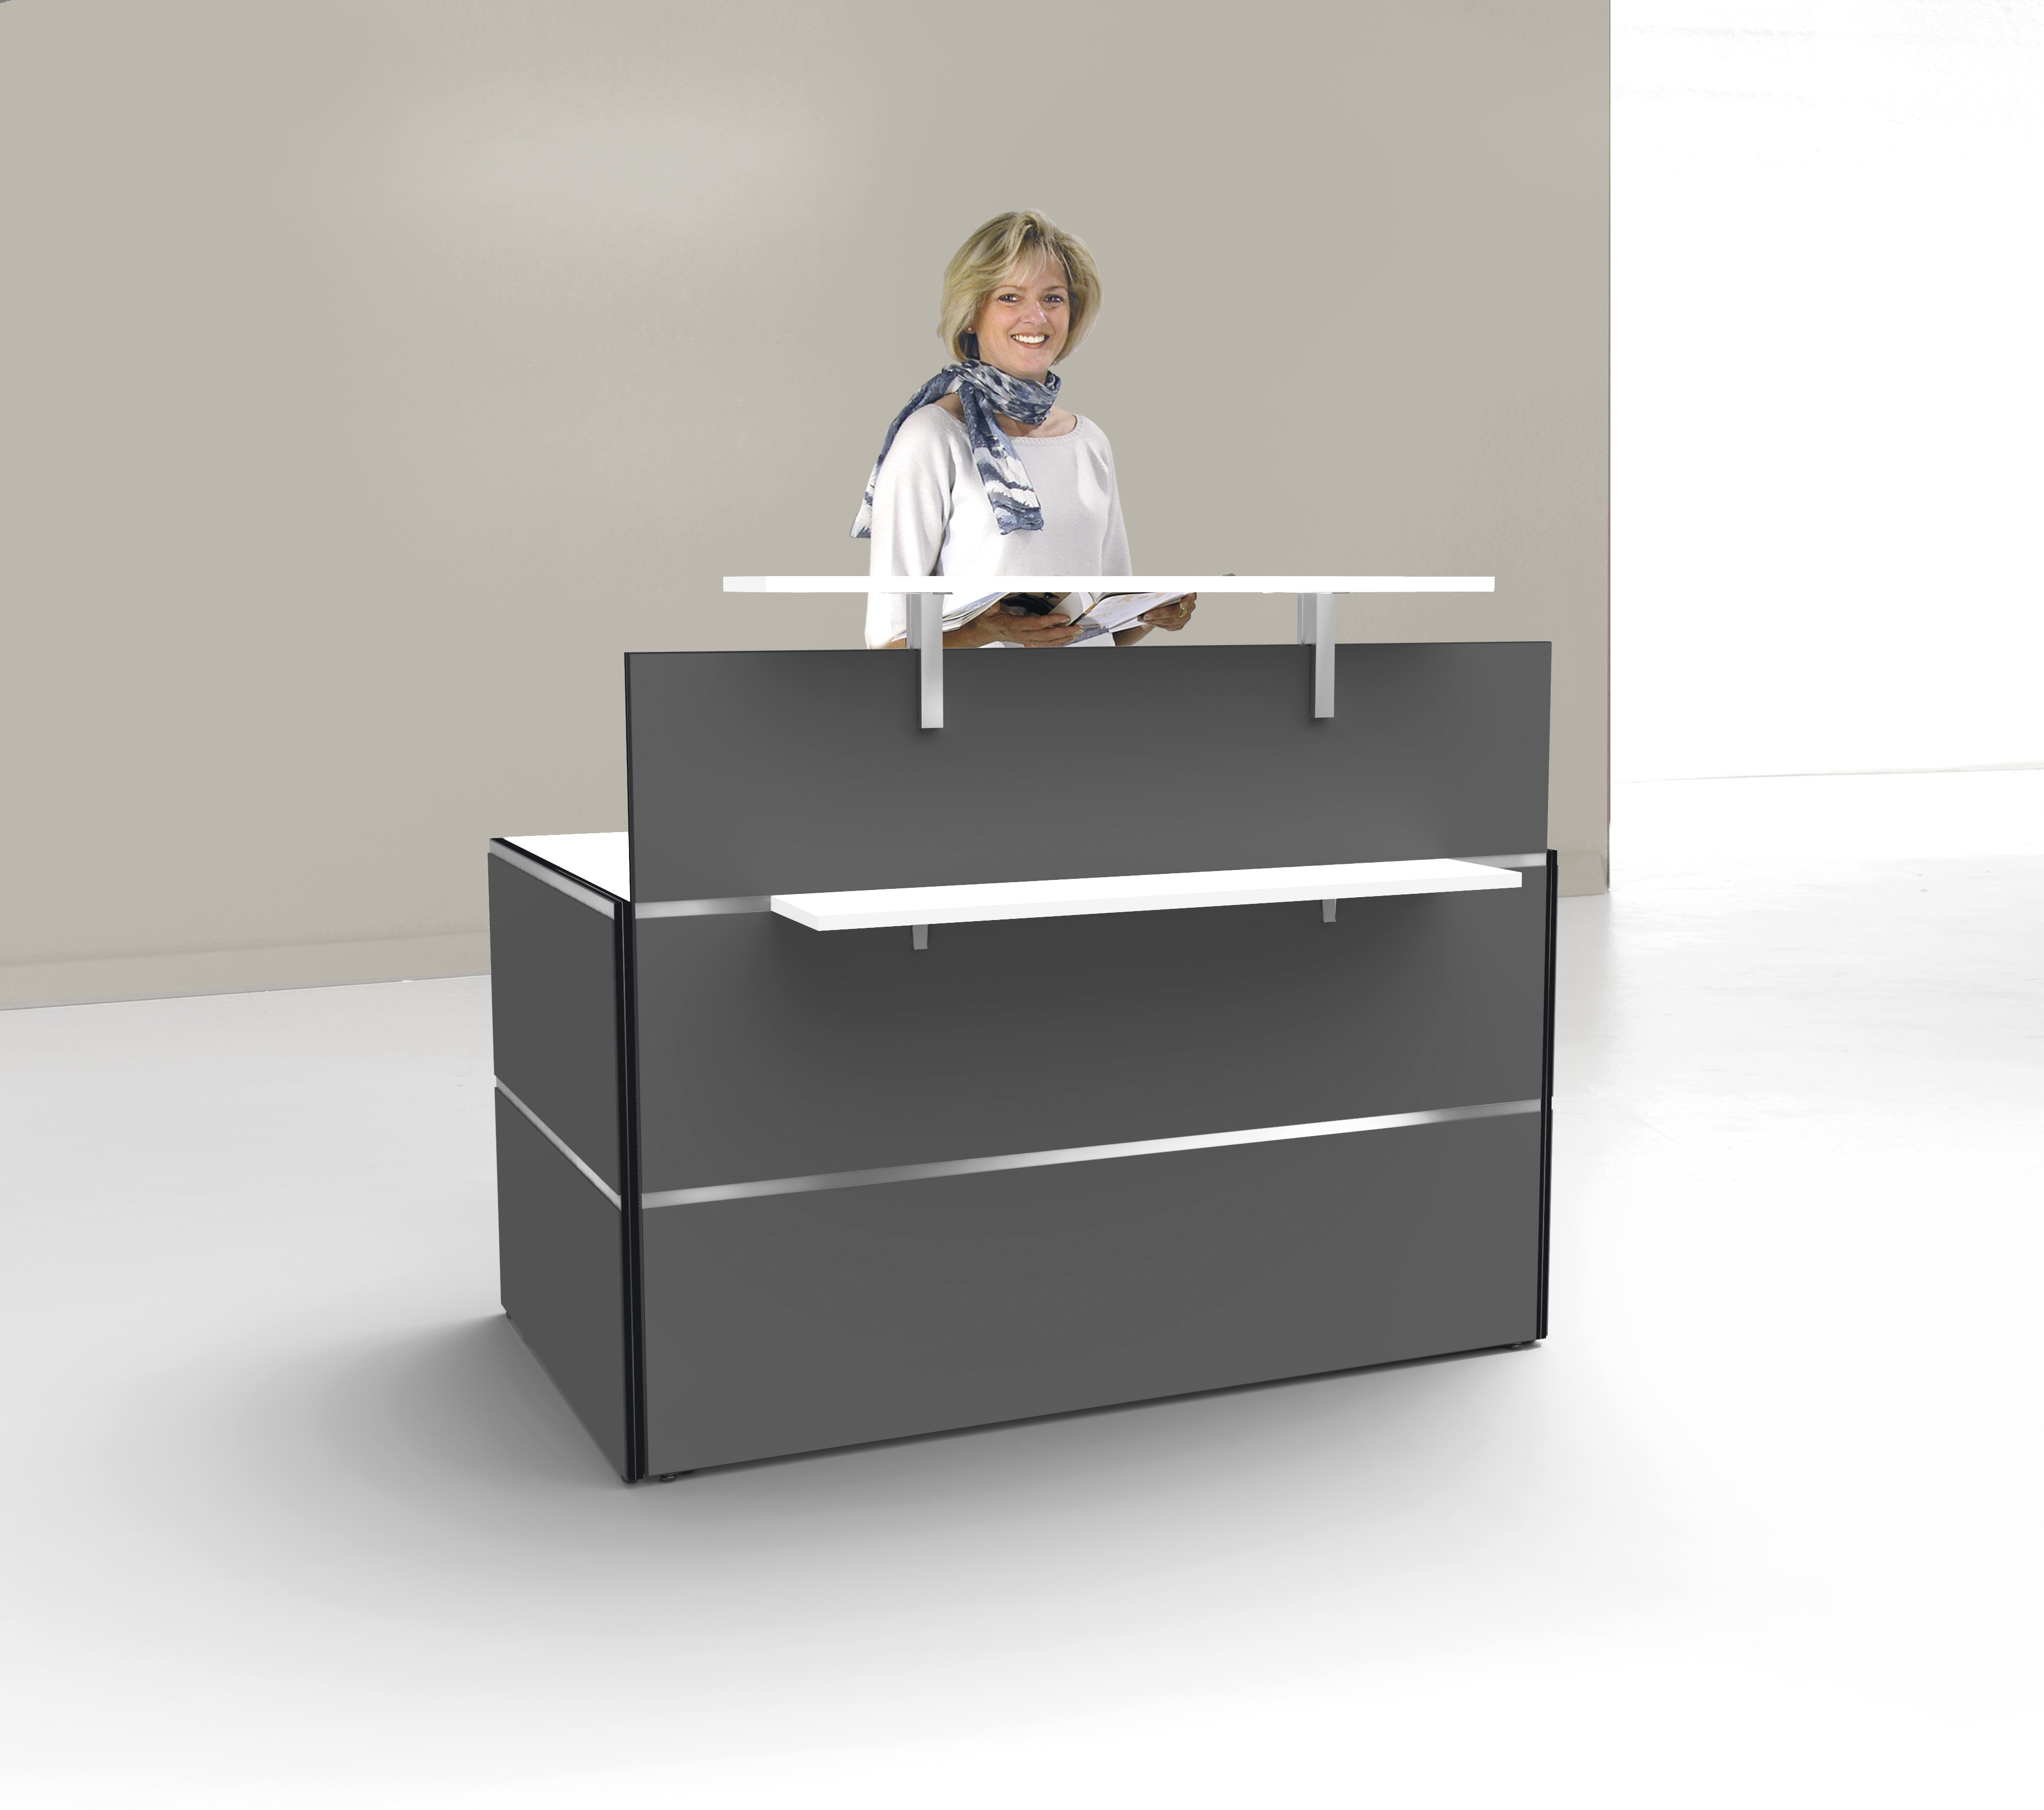 ERGONOMIA - sillas para oficinas - mobiliario de oficinas - sillas ...